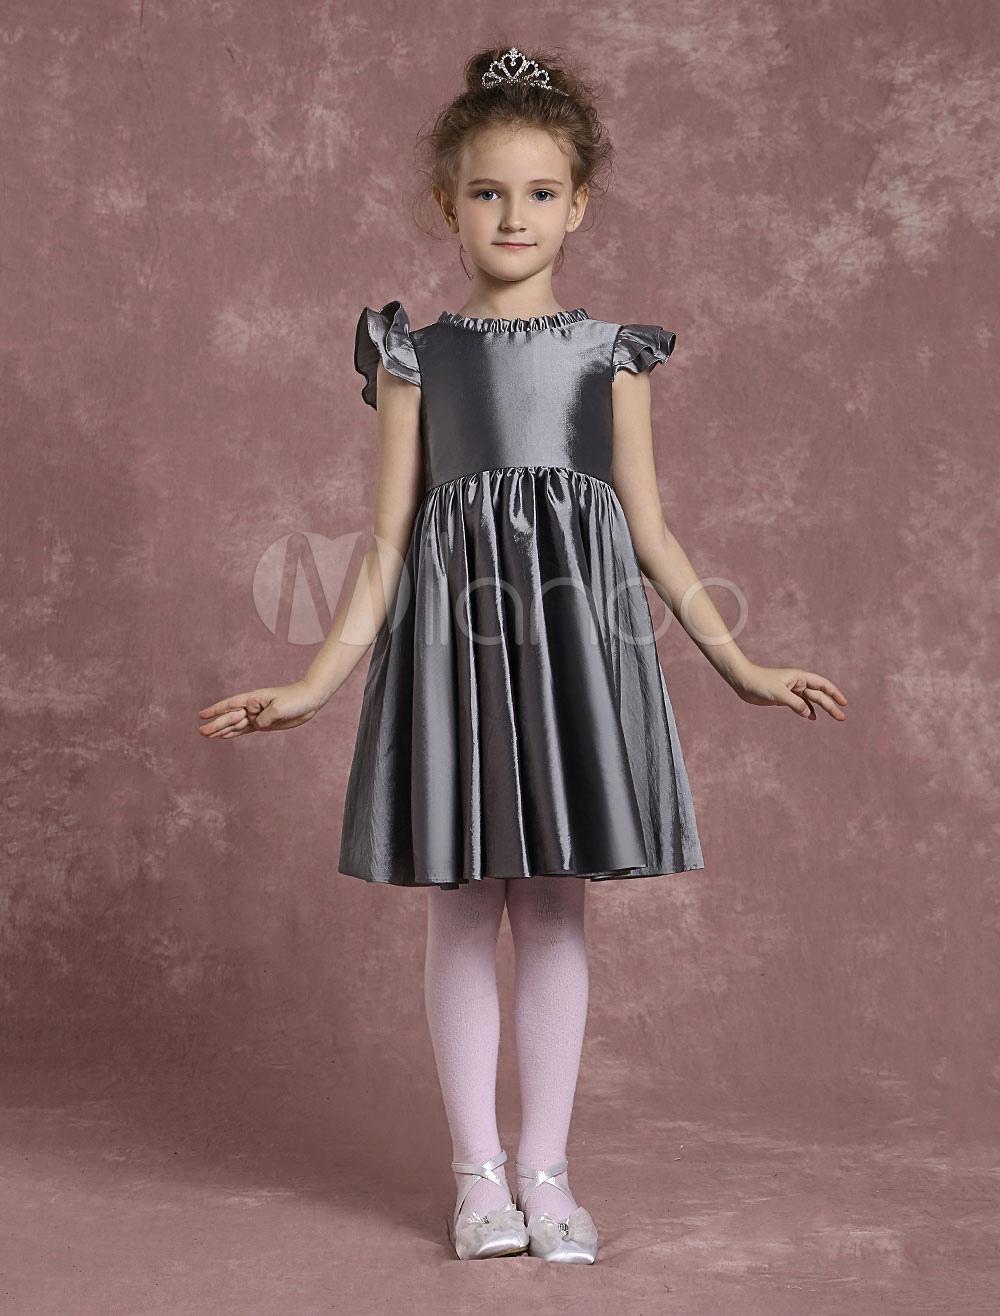 Buy Grey Flower Girl Dresses Knee Length Taffeta Pageant Dresses Toddler's Zipper Pleated A Line Formal Dresses for $58.89 in Milanoo store